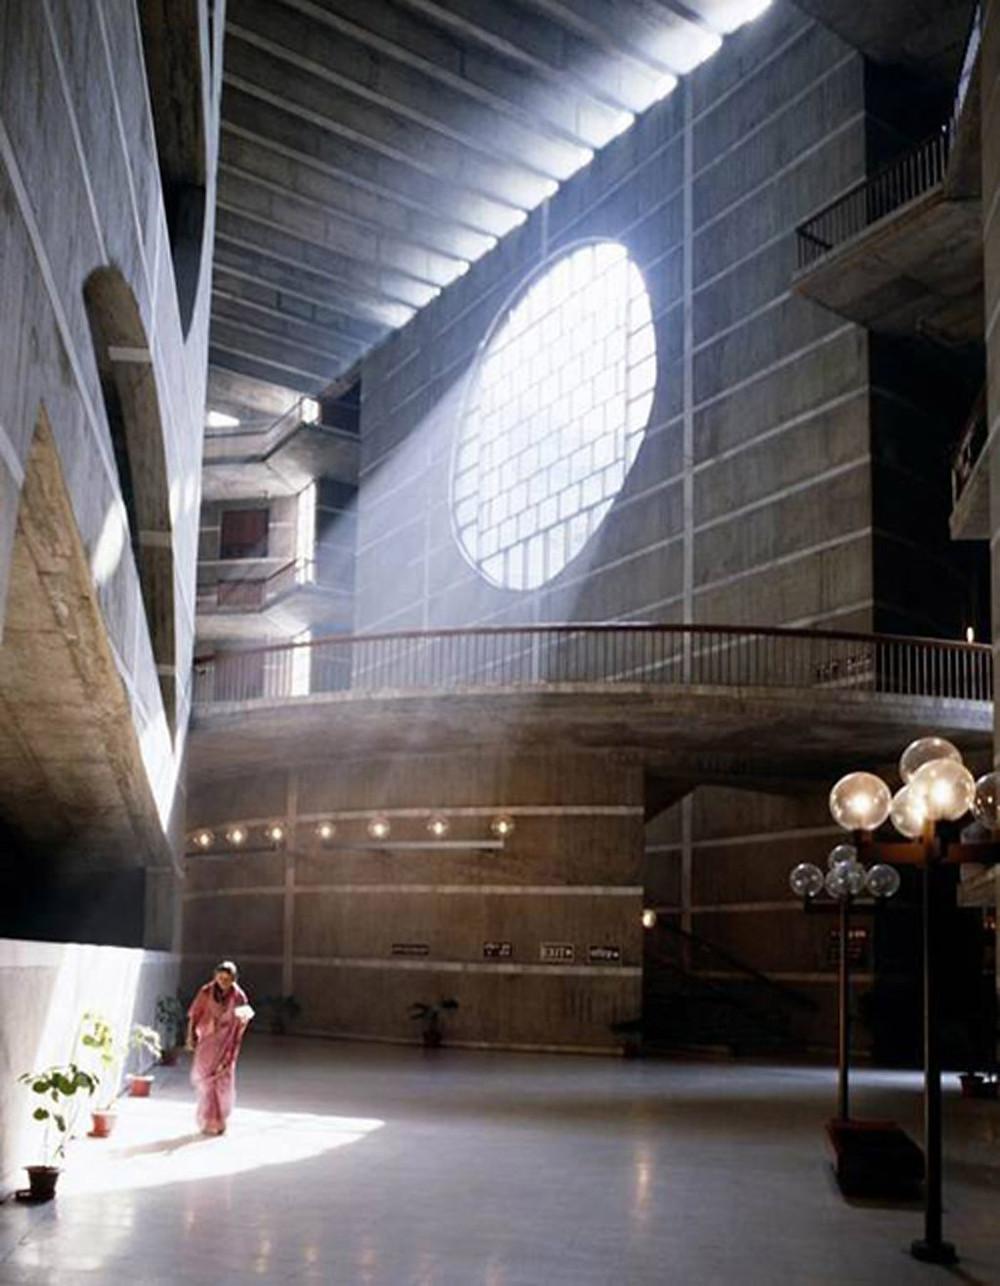 אור טבעי בתכנון אדריכלי | סטודיו85 | אדריכלית שירי מוטס לוין